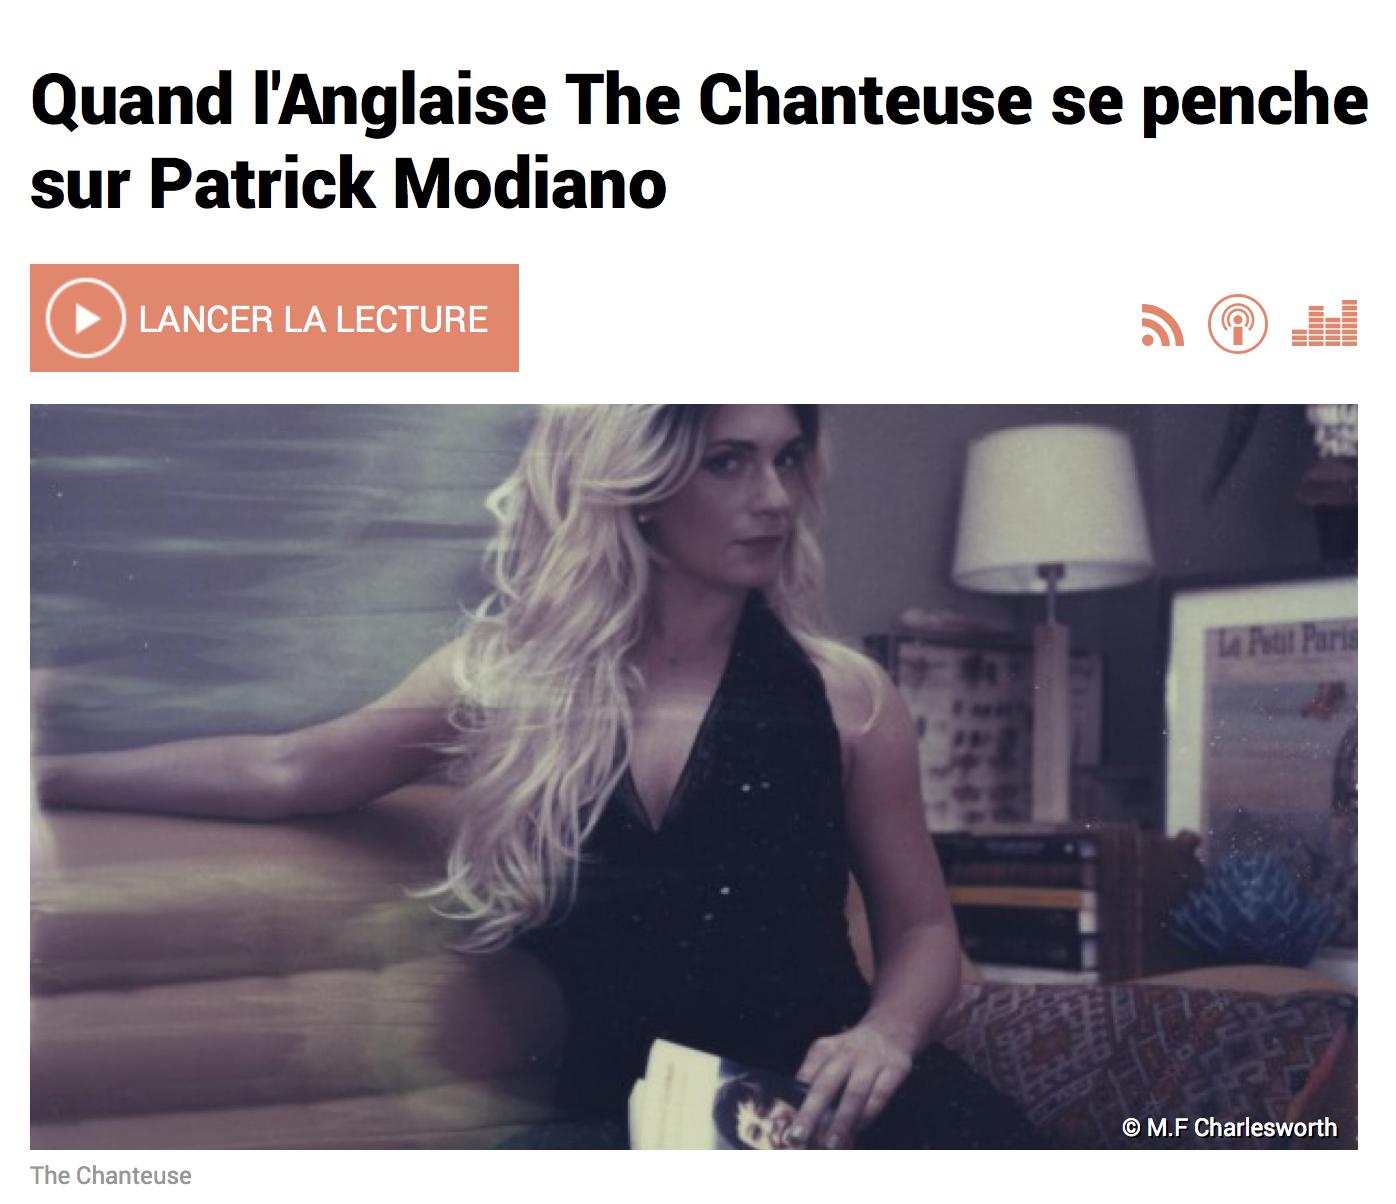 RFI modiano the chanteuse